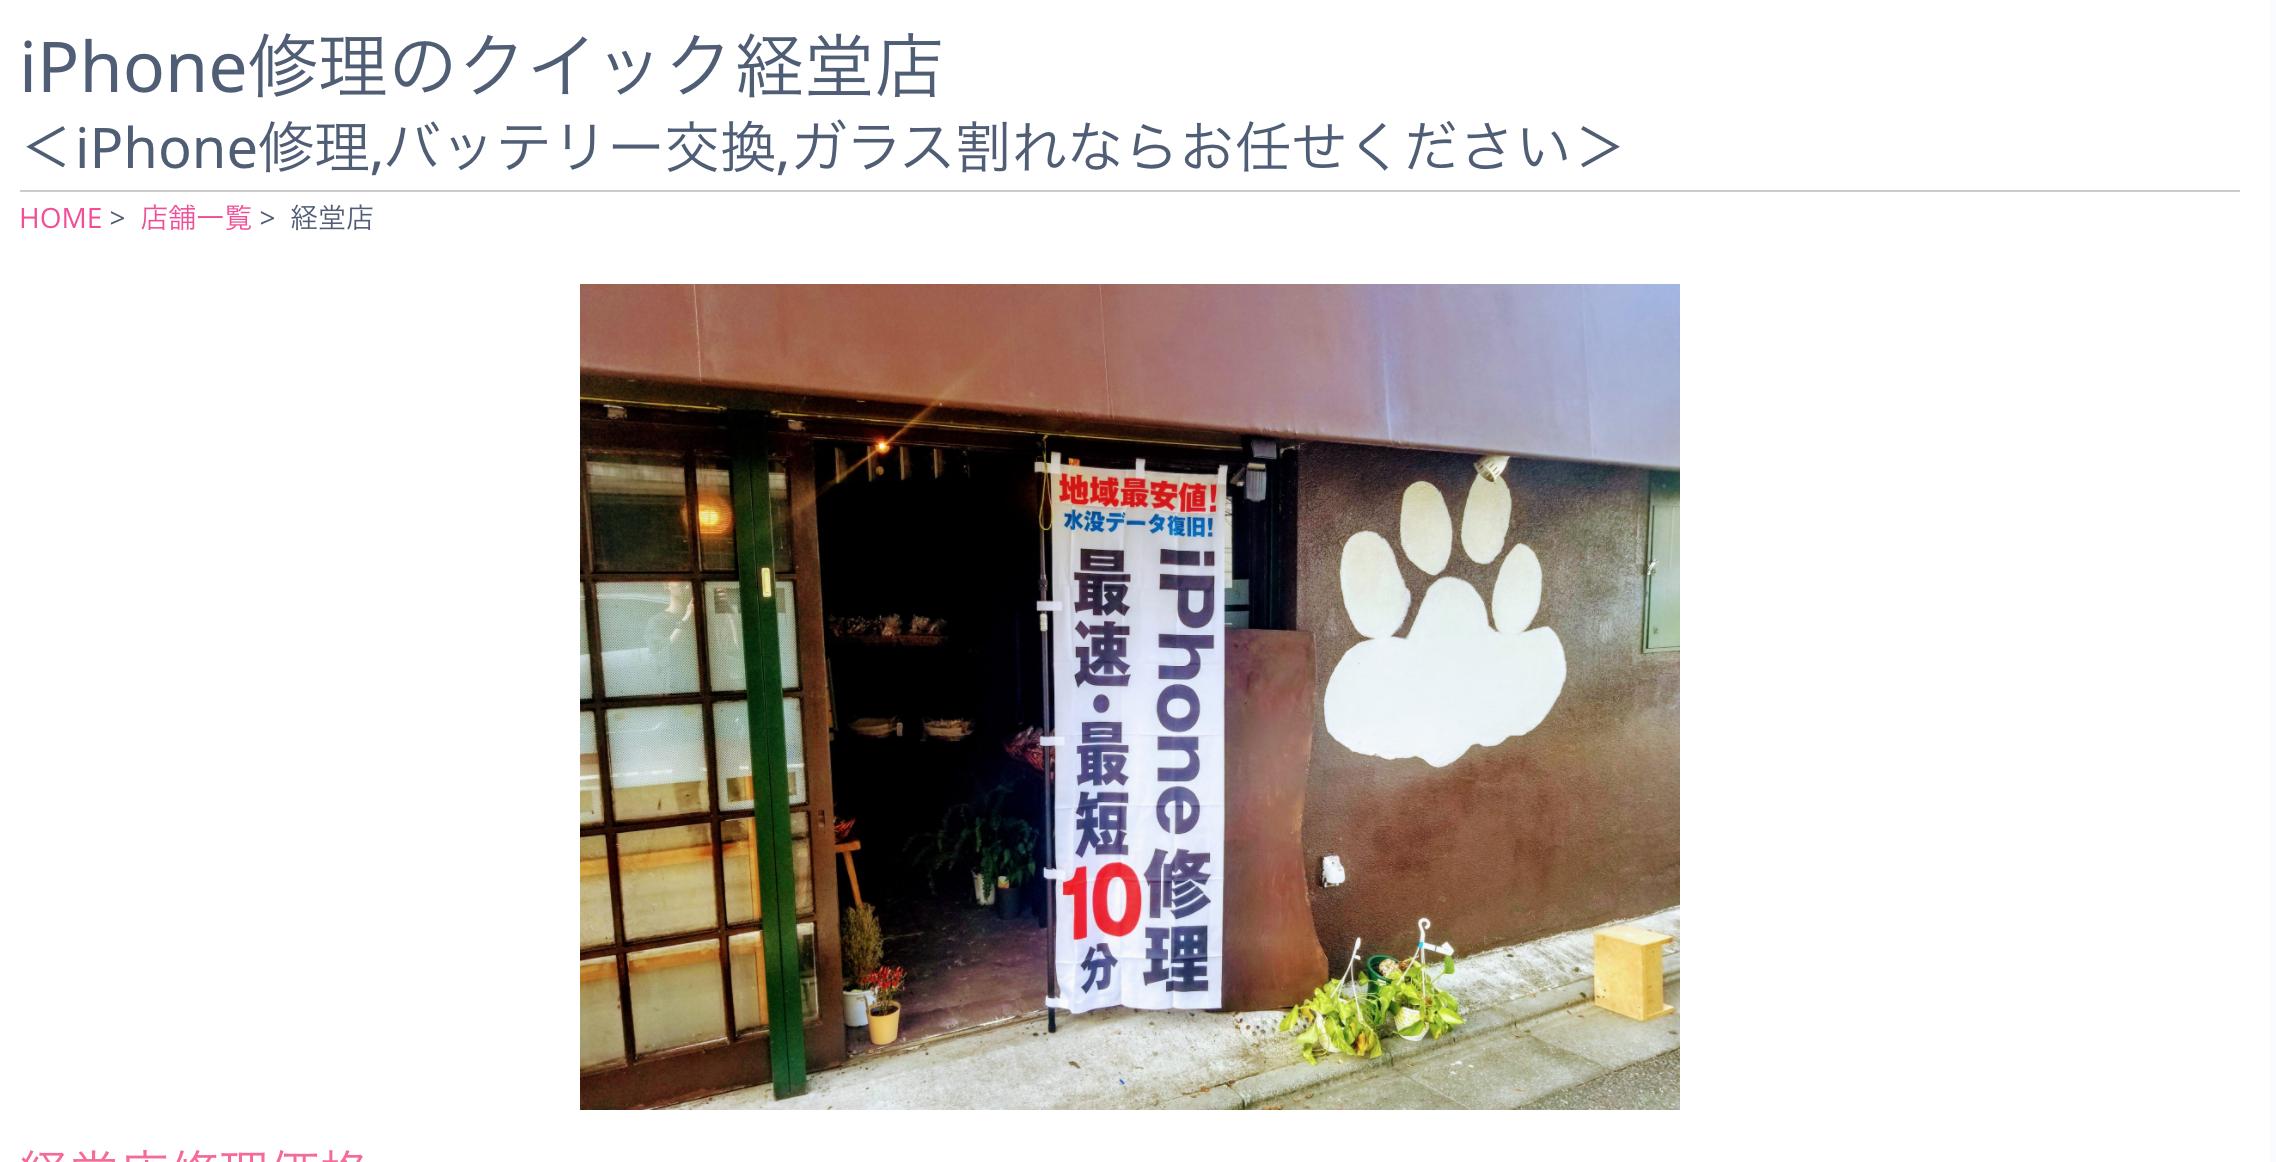 iPhone修理のクイック経堂店